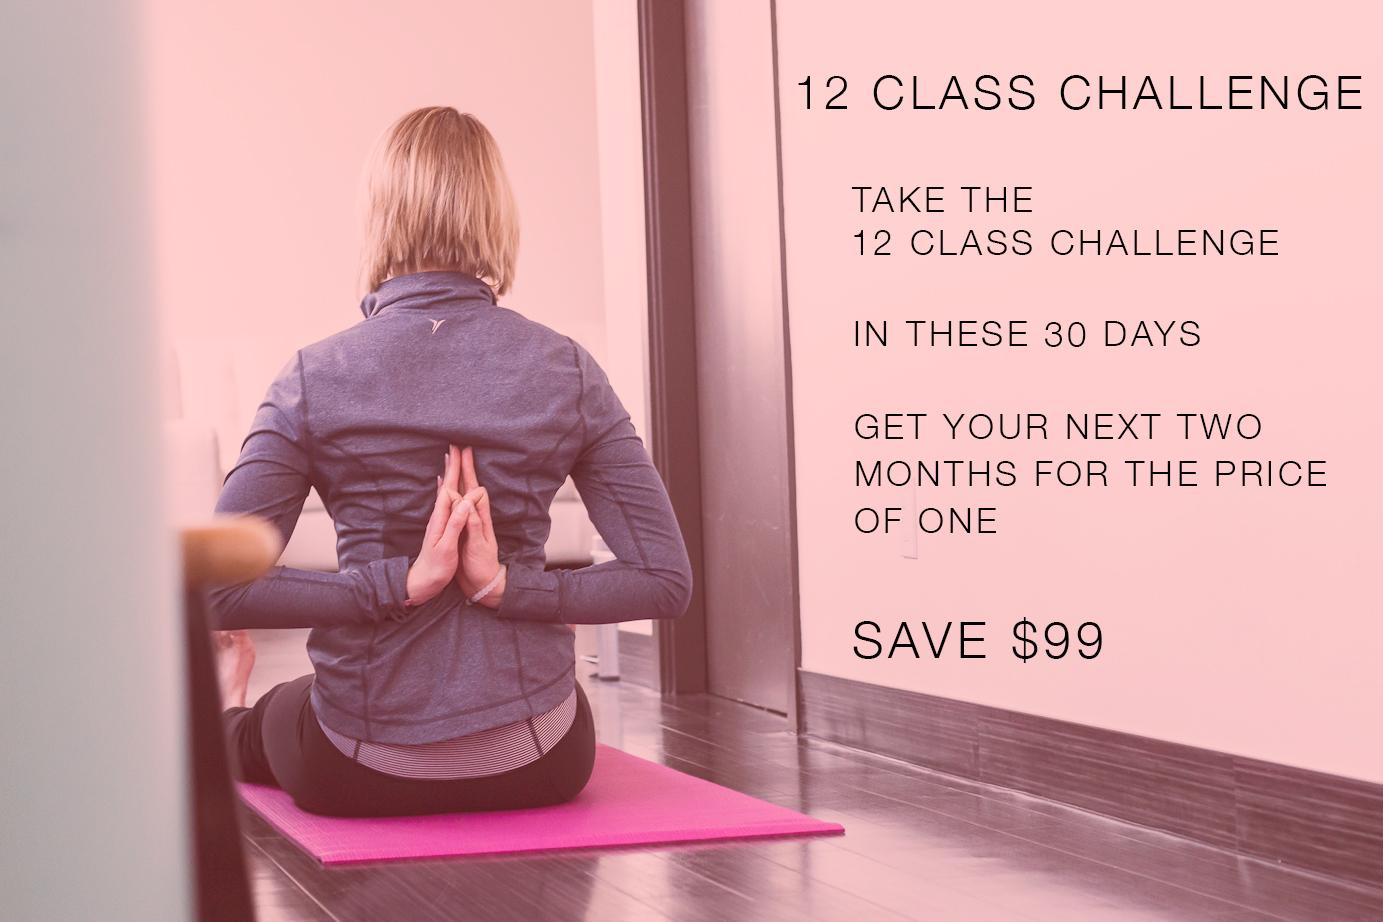 Yogalife new student 12 class yoga challenge